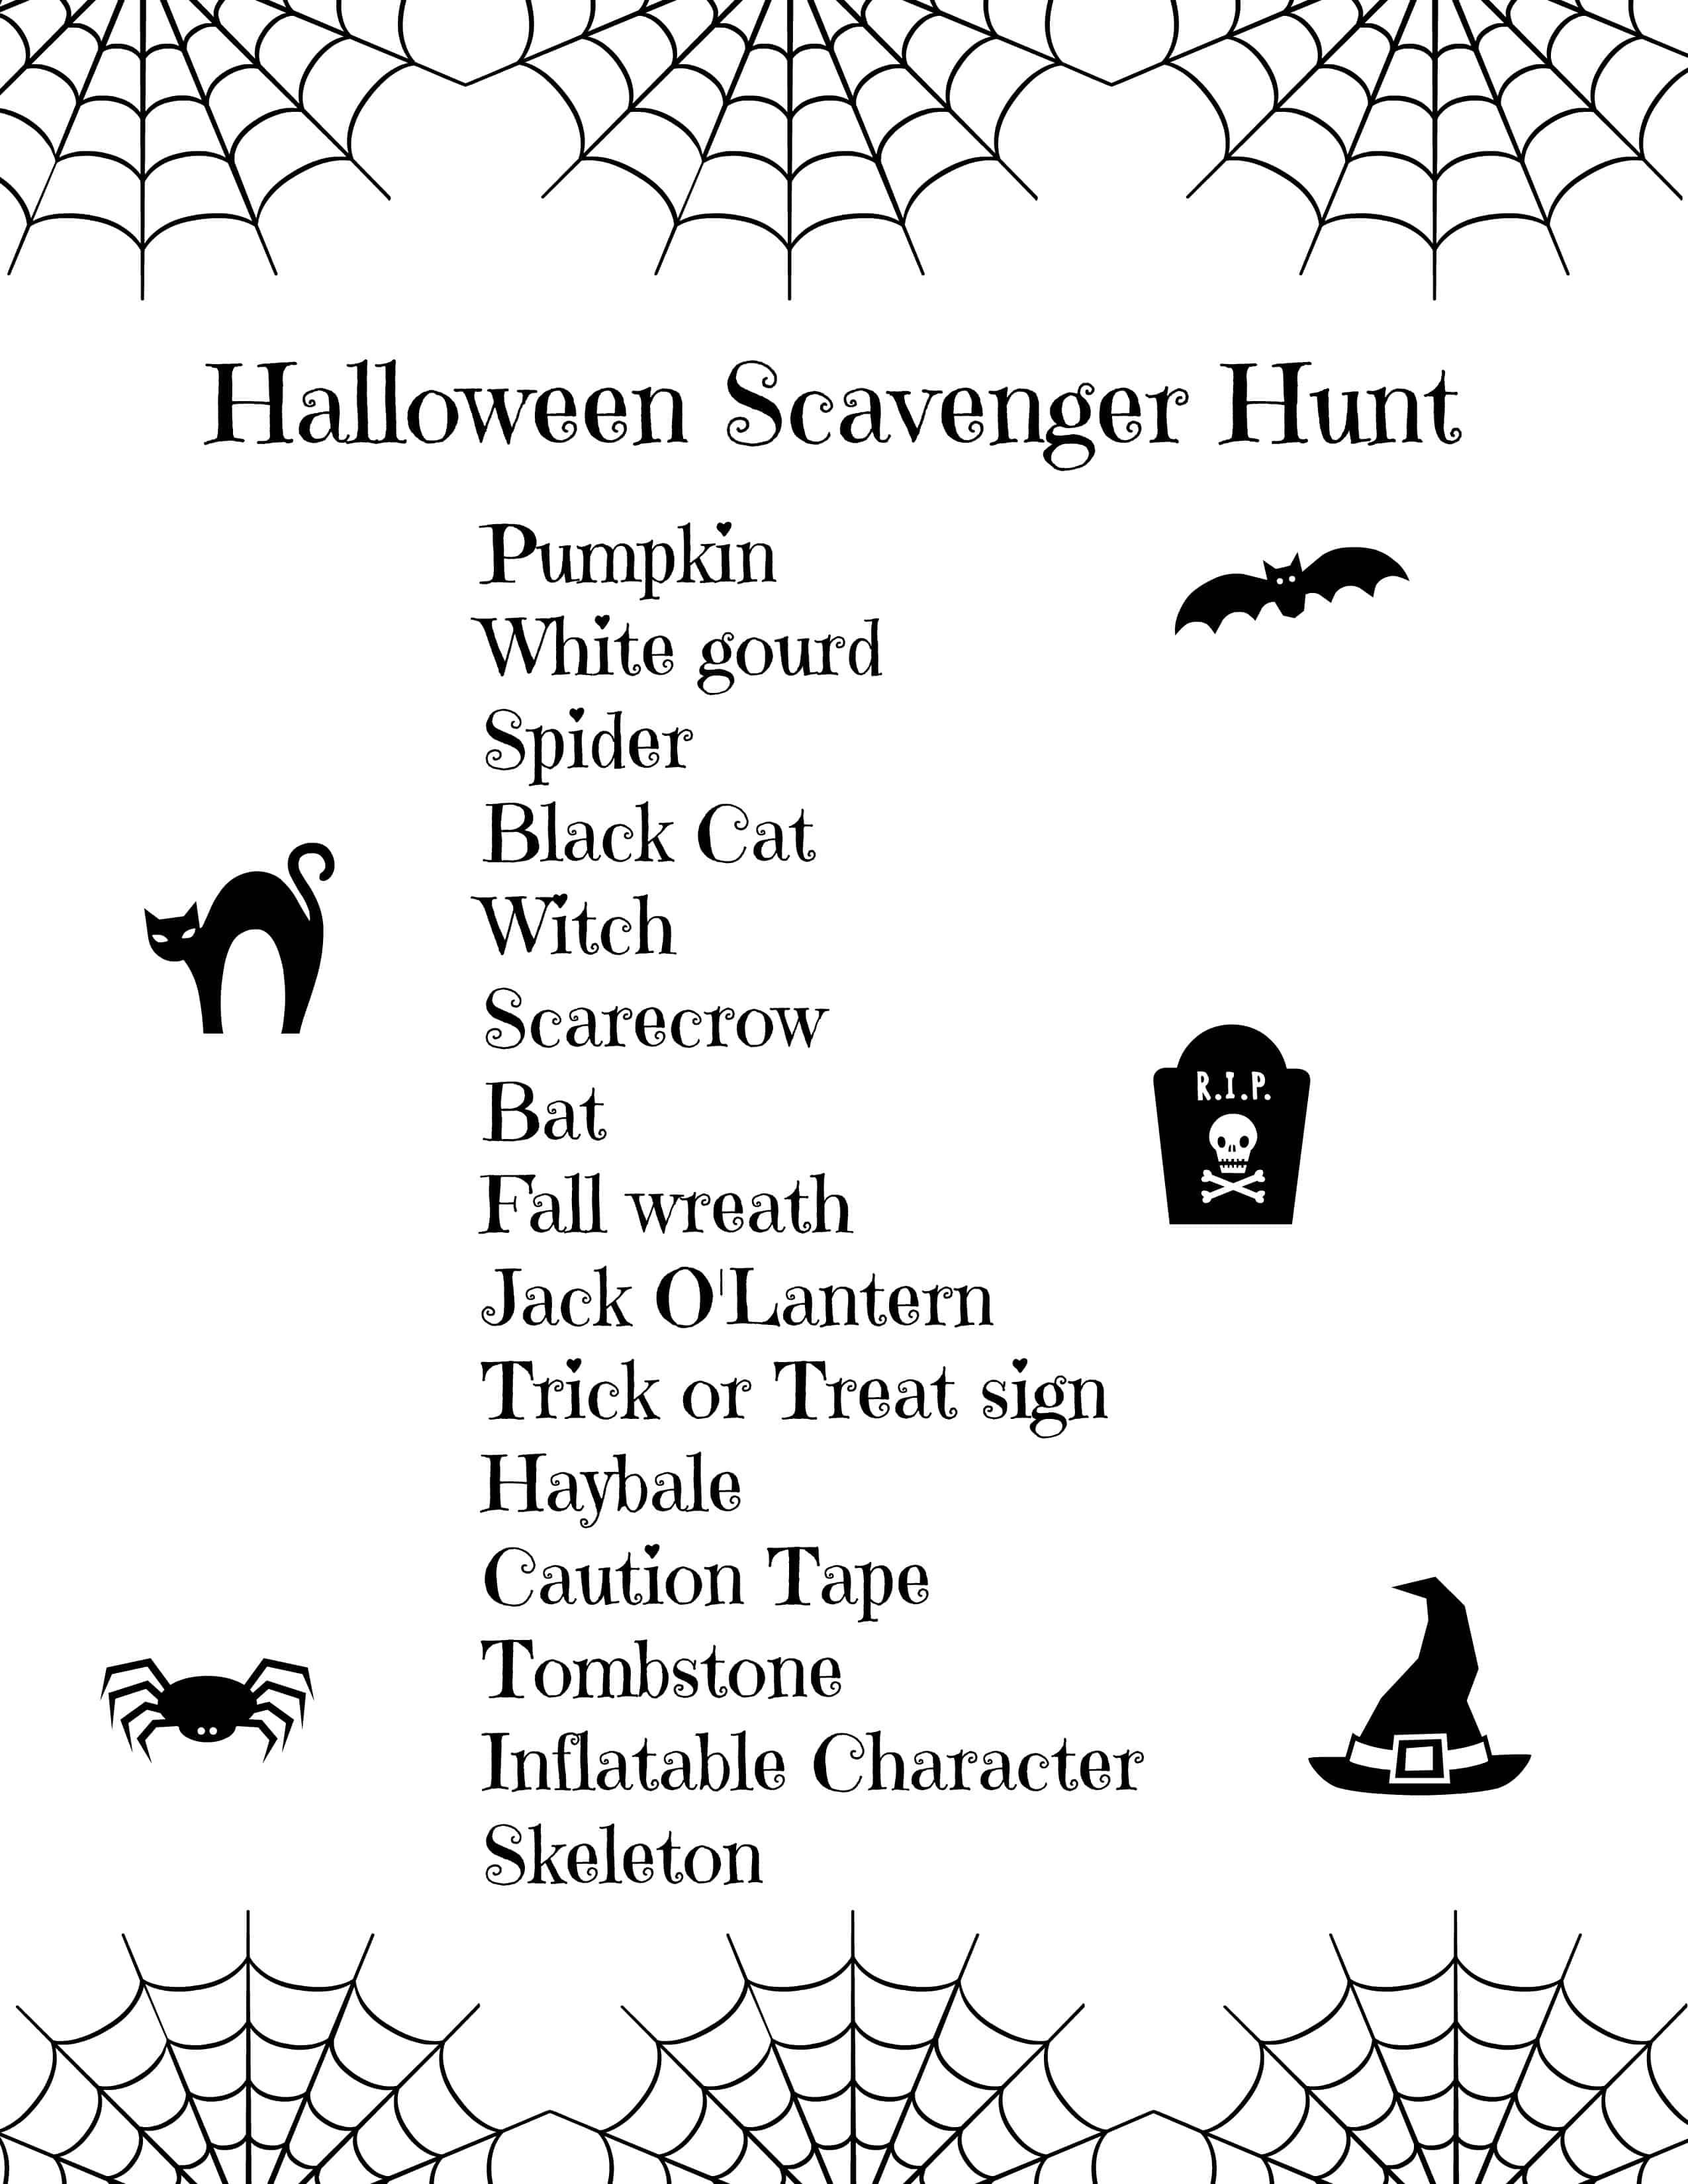 Halloween Scavenger Hunt For Kids Free Printable